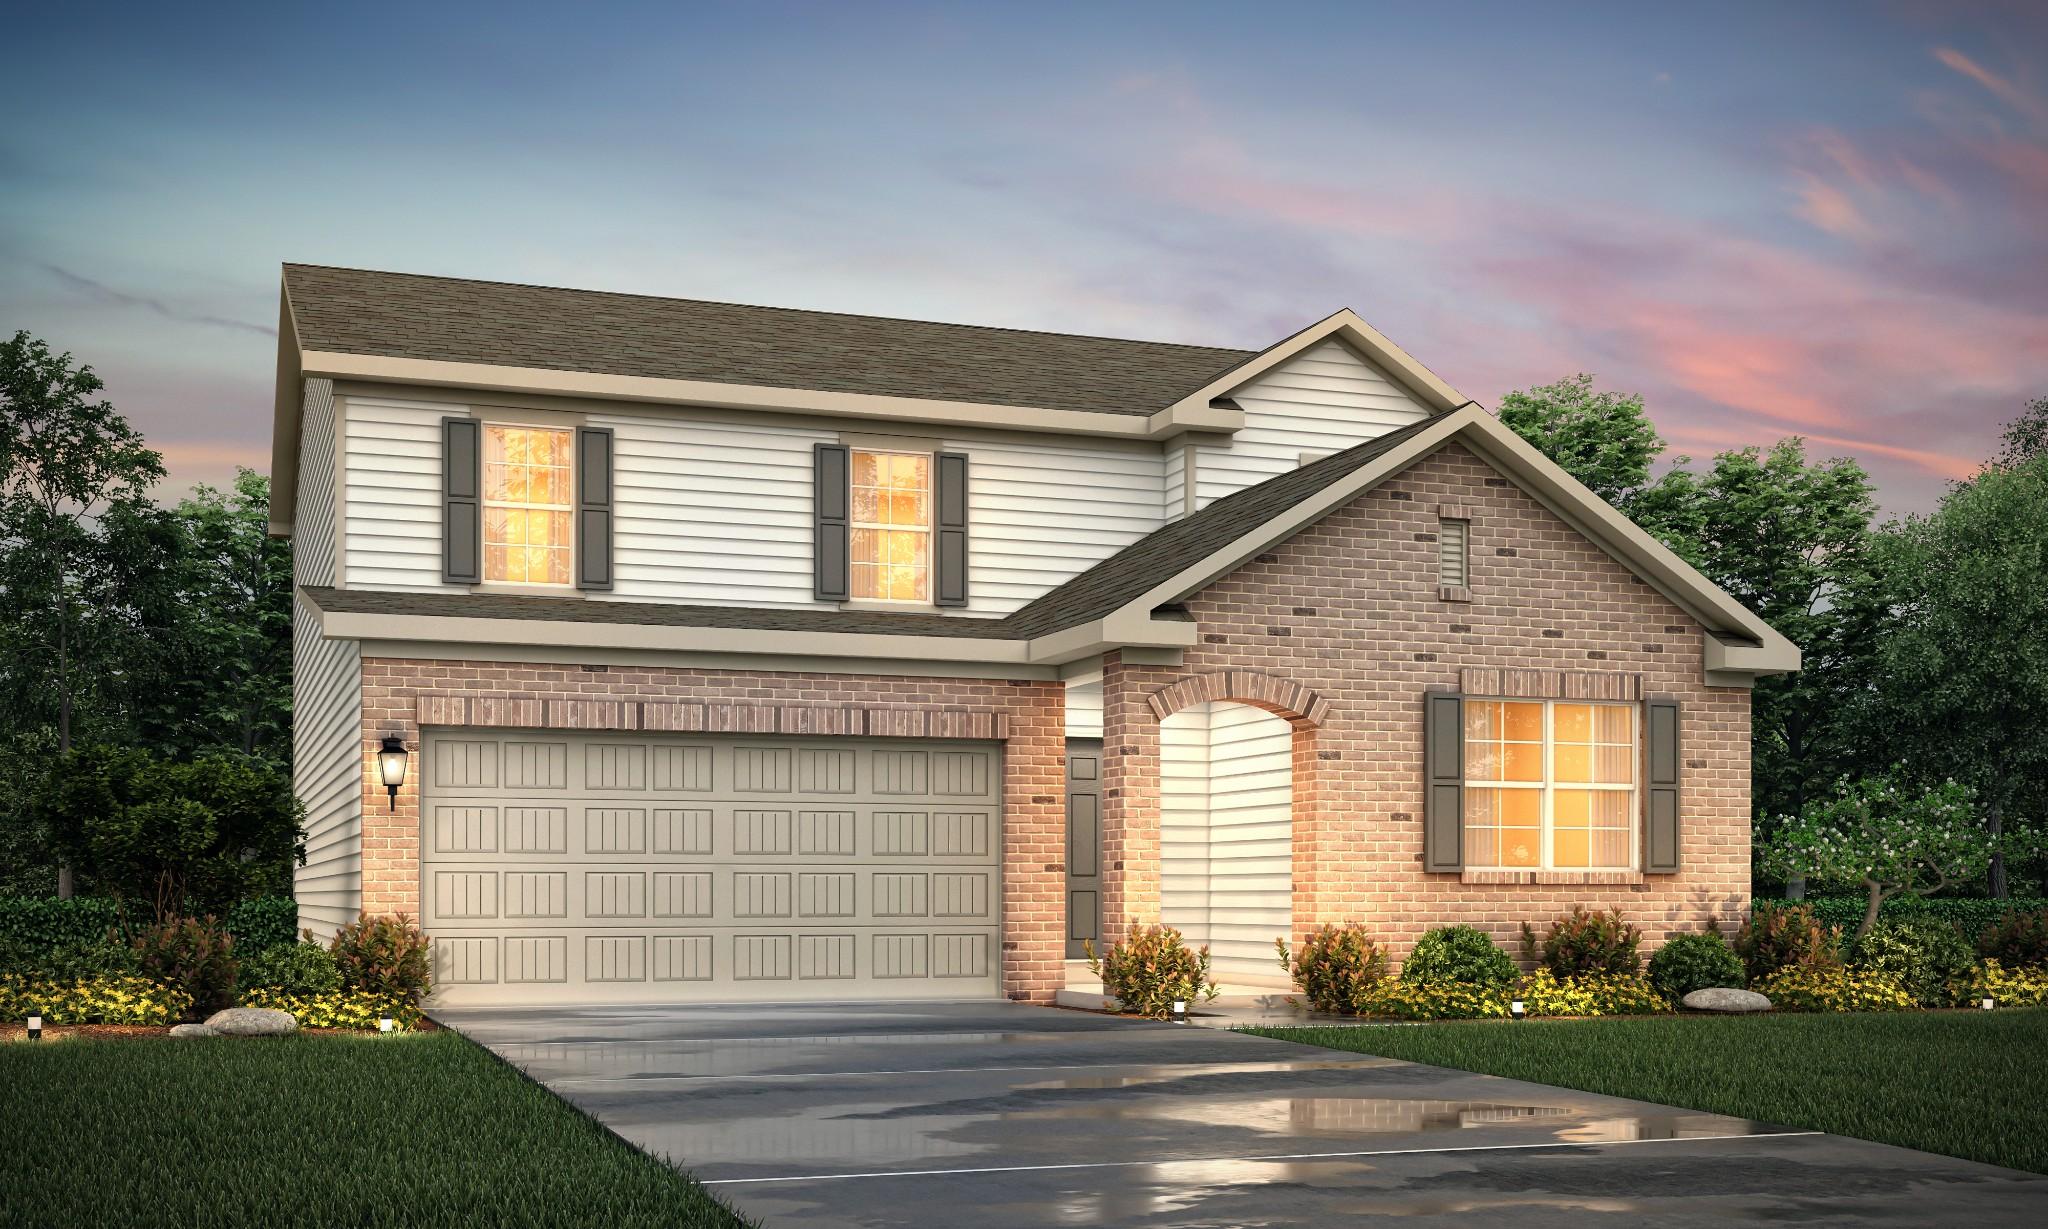 801 Amberton Dr Lot 151, Smyrna, TN 37167 - Smyrna, TN real estate listing